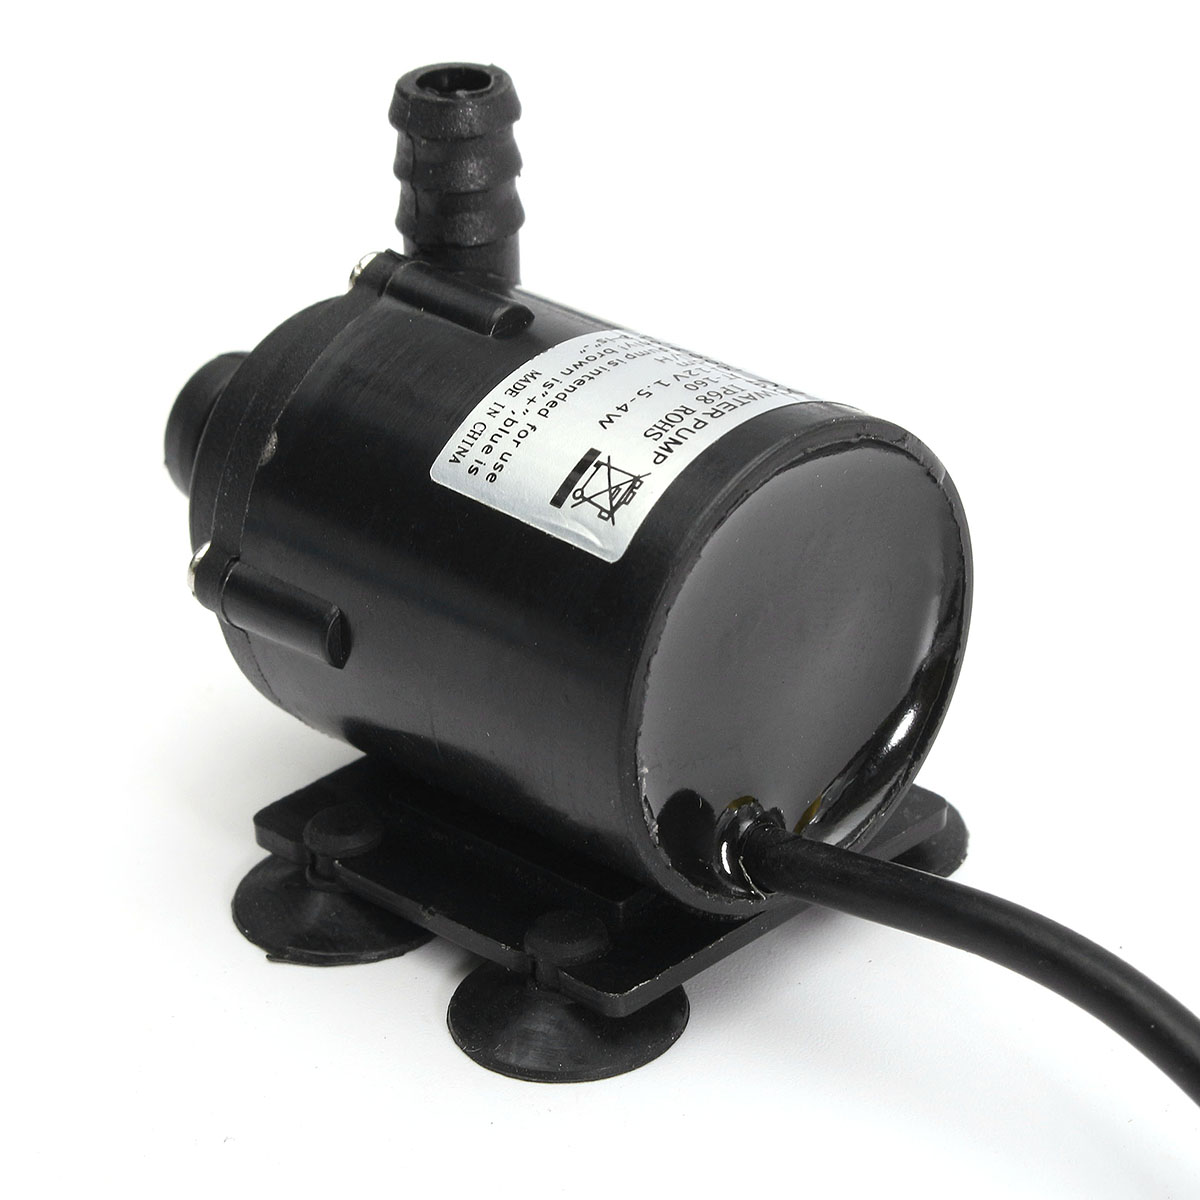 12V 280L/H Water Pump Mini Brushless Water Pump Submersible Motor